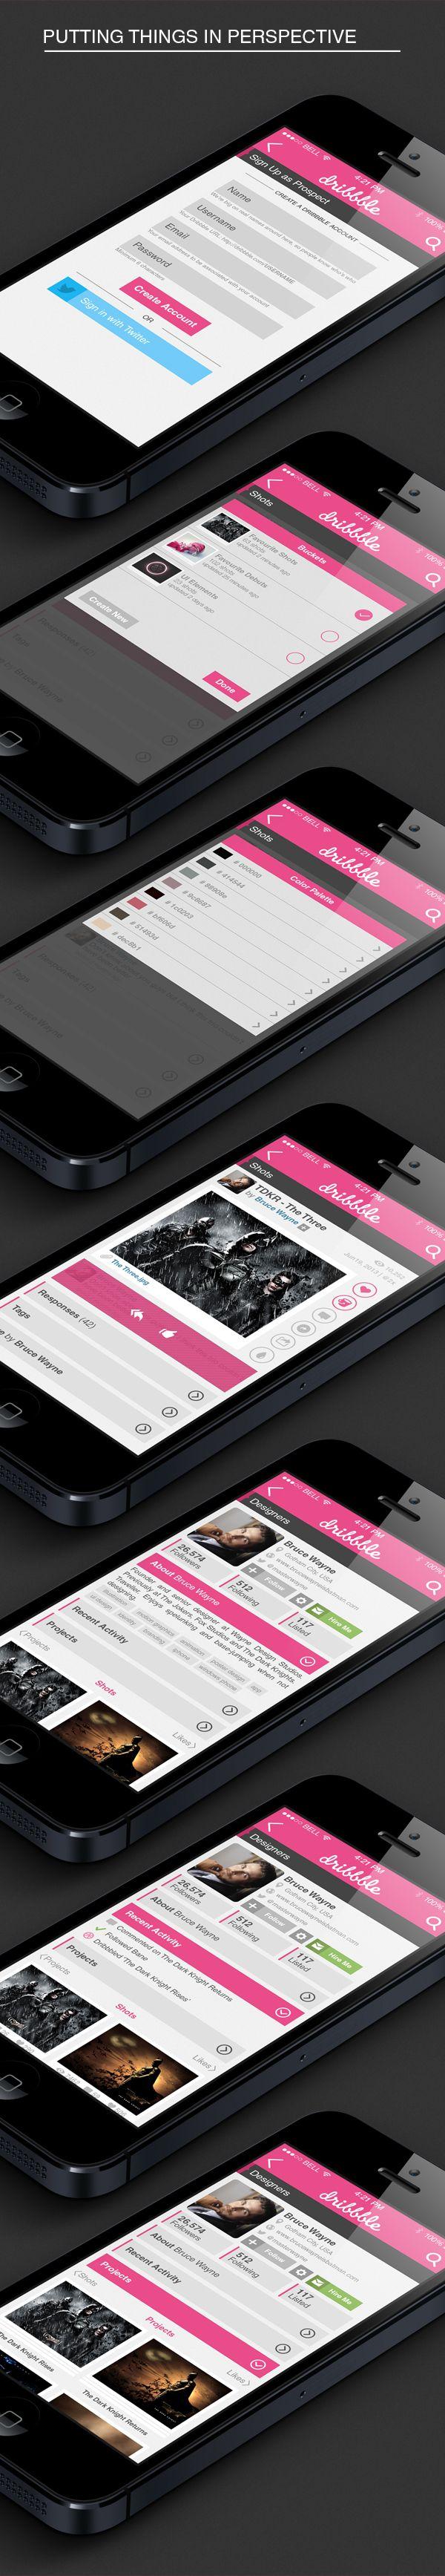 Dribbble iOS7 App - User Interface Design by Limitless Creativity, via Behance